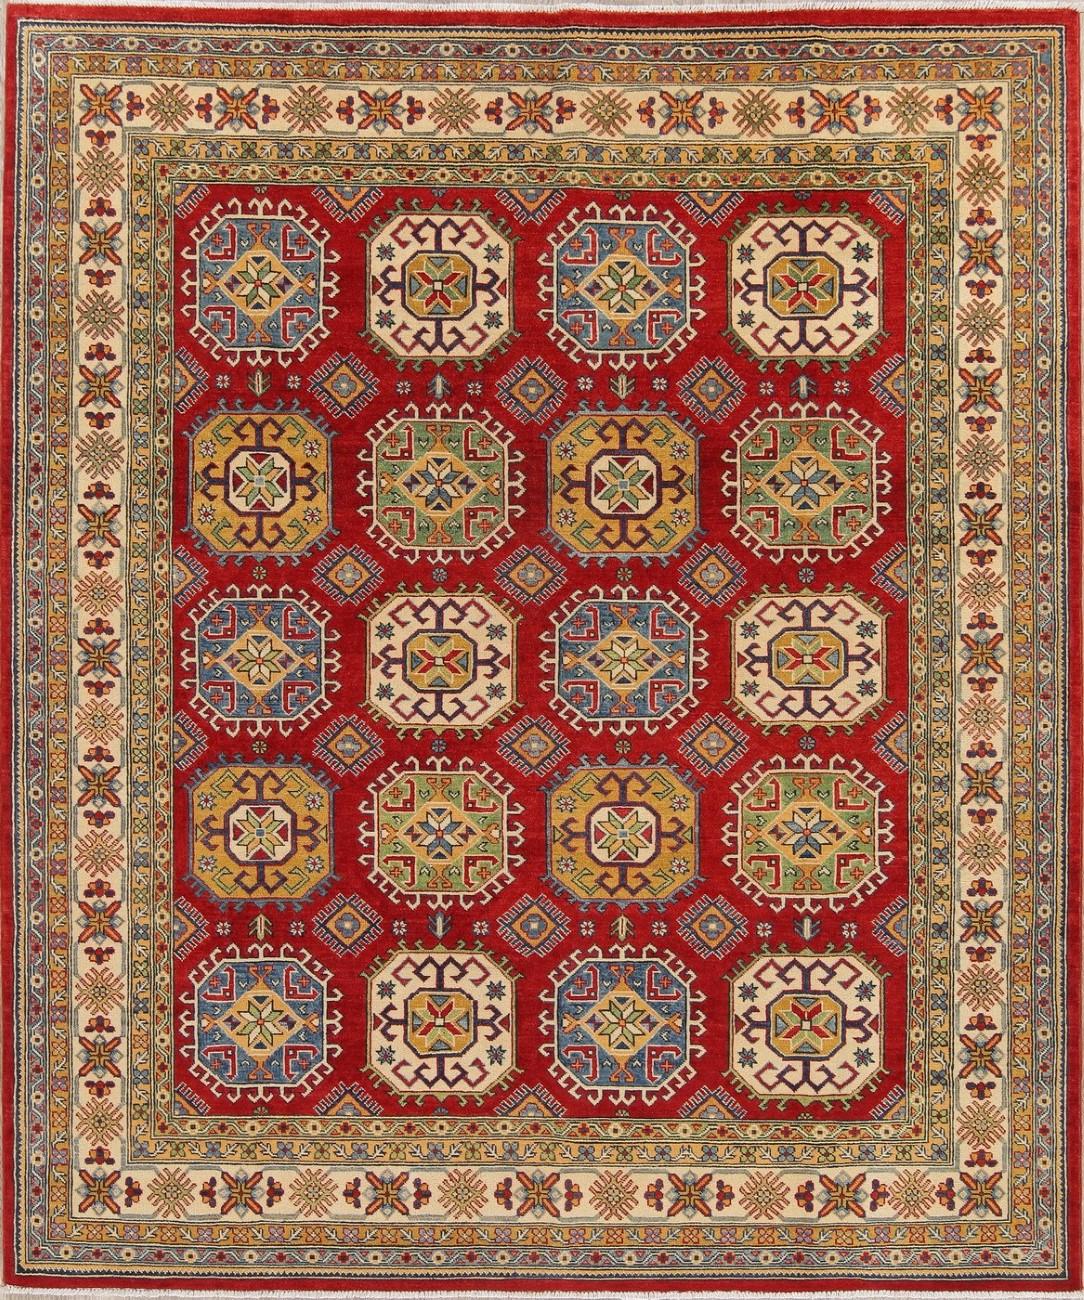 Breathtaking Large Geometric Red 10x12 Bakhtiari Persian: NEW Superb Geometric 8x10 Kazak Area Rug Hand-Knotted